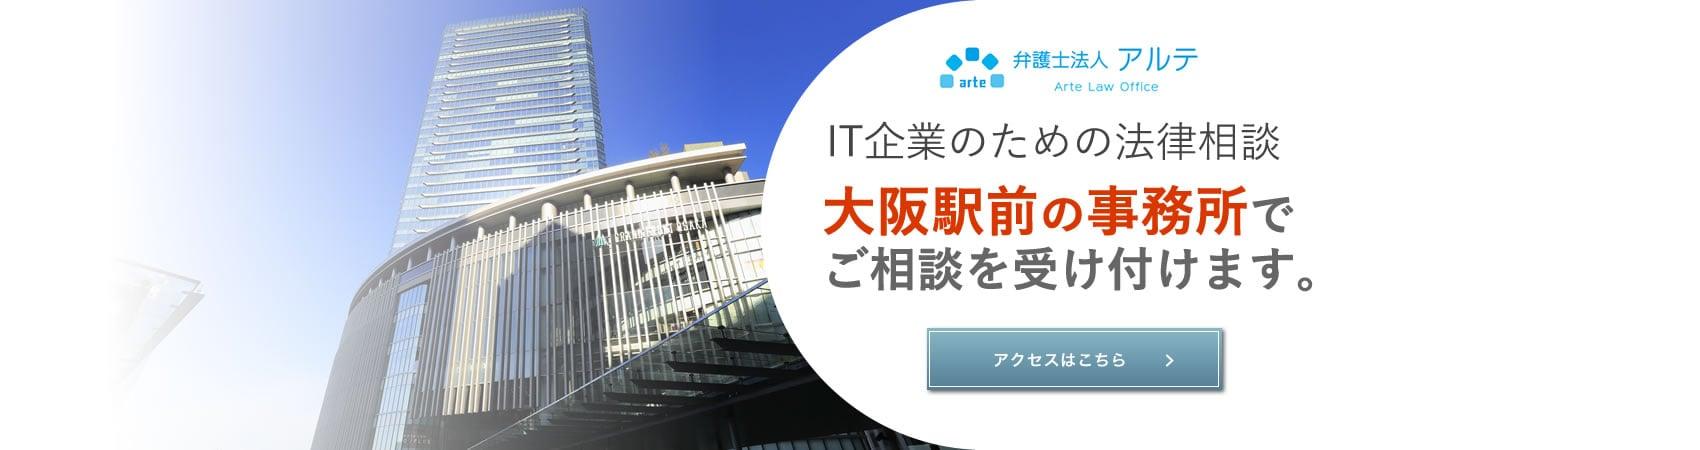 IT企業のための法律相談 大阪駅前の事務所でご相談を受け付けます。 アクセスはこちら